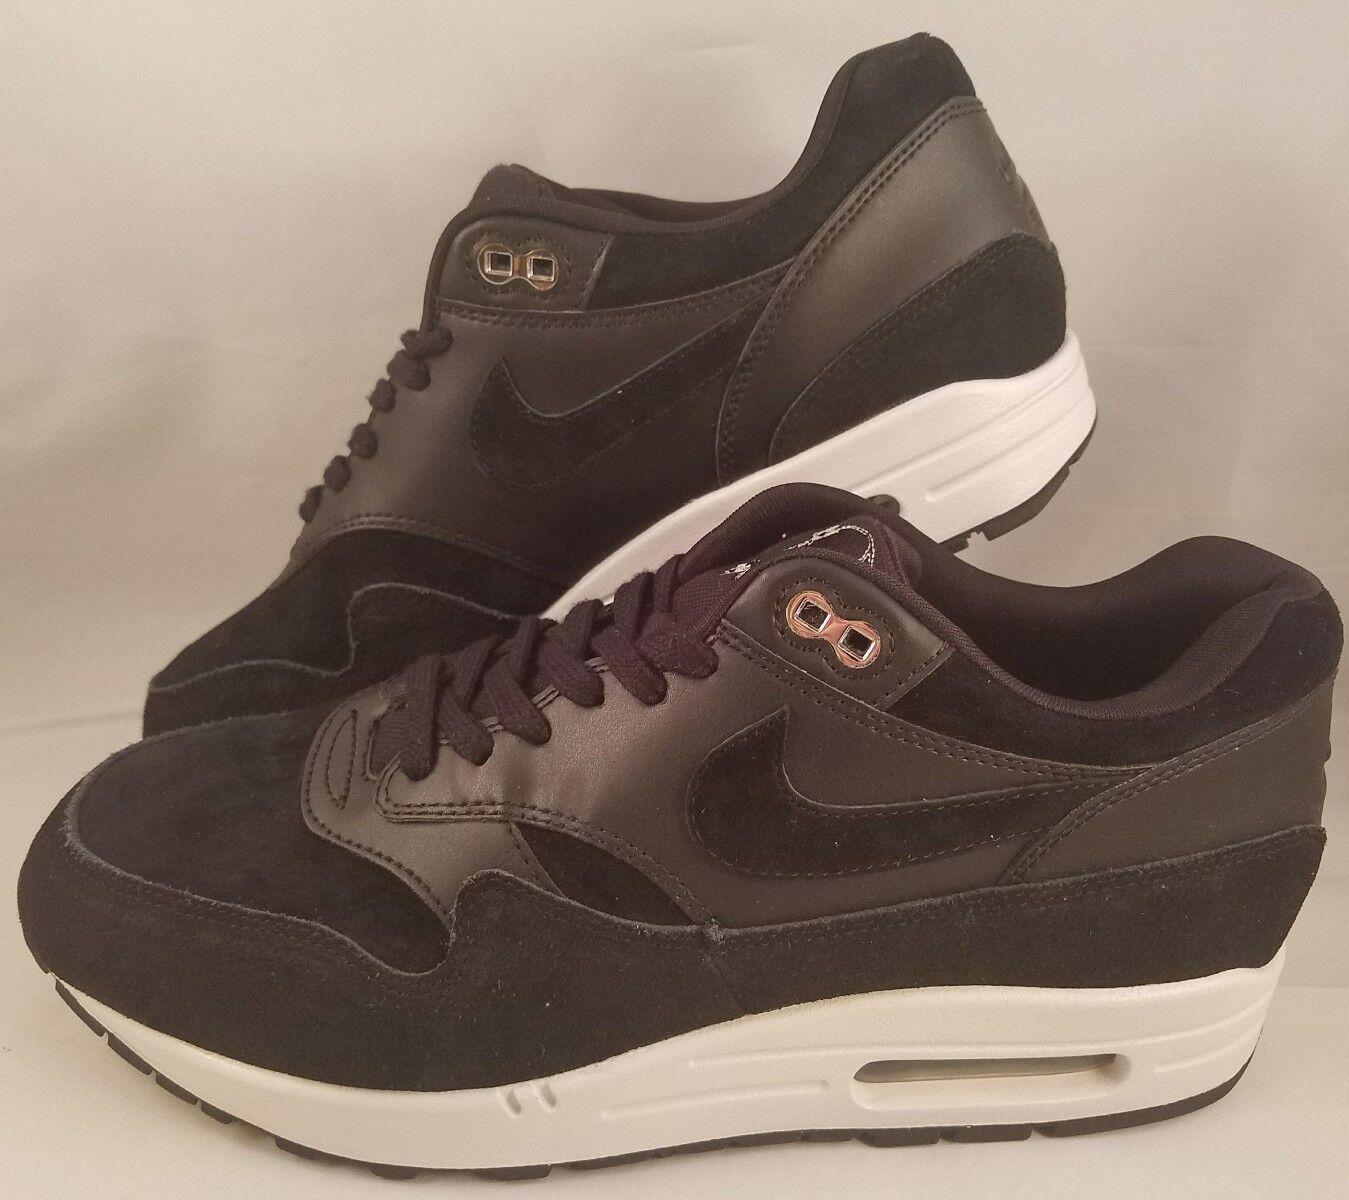 Nike air max 1 premium - rebell schwarze schädel laufschuhe männer schwarze rebell 875844-001 größe 9. d61c1a